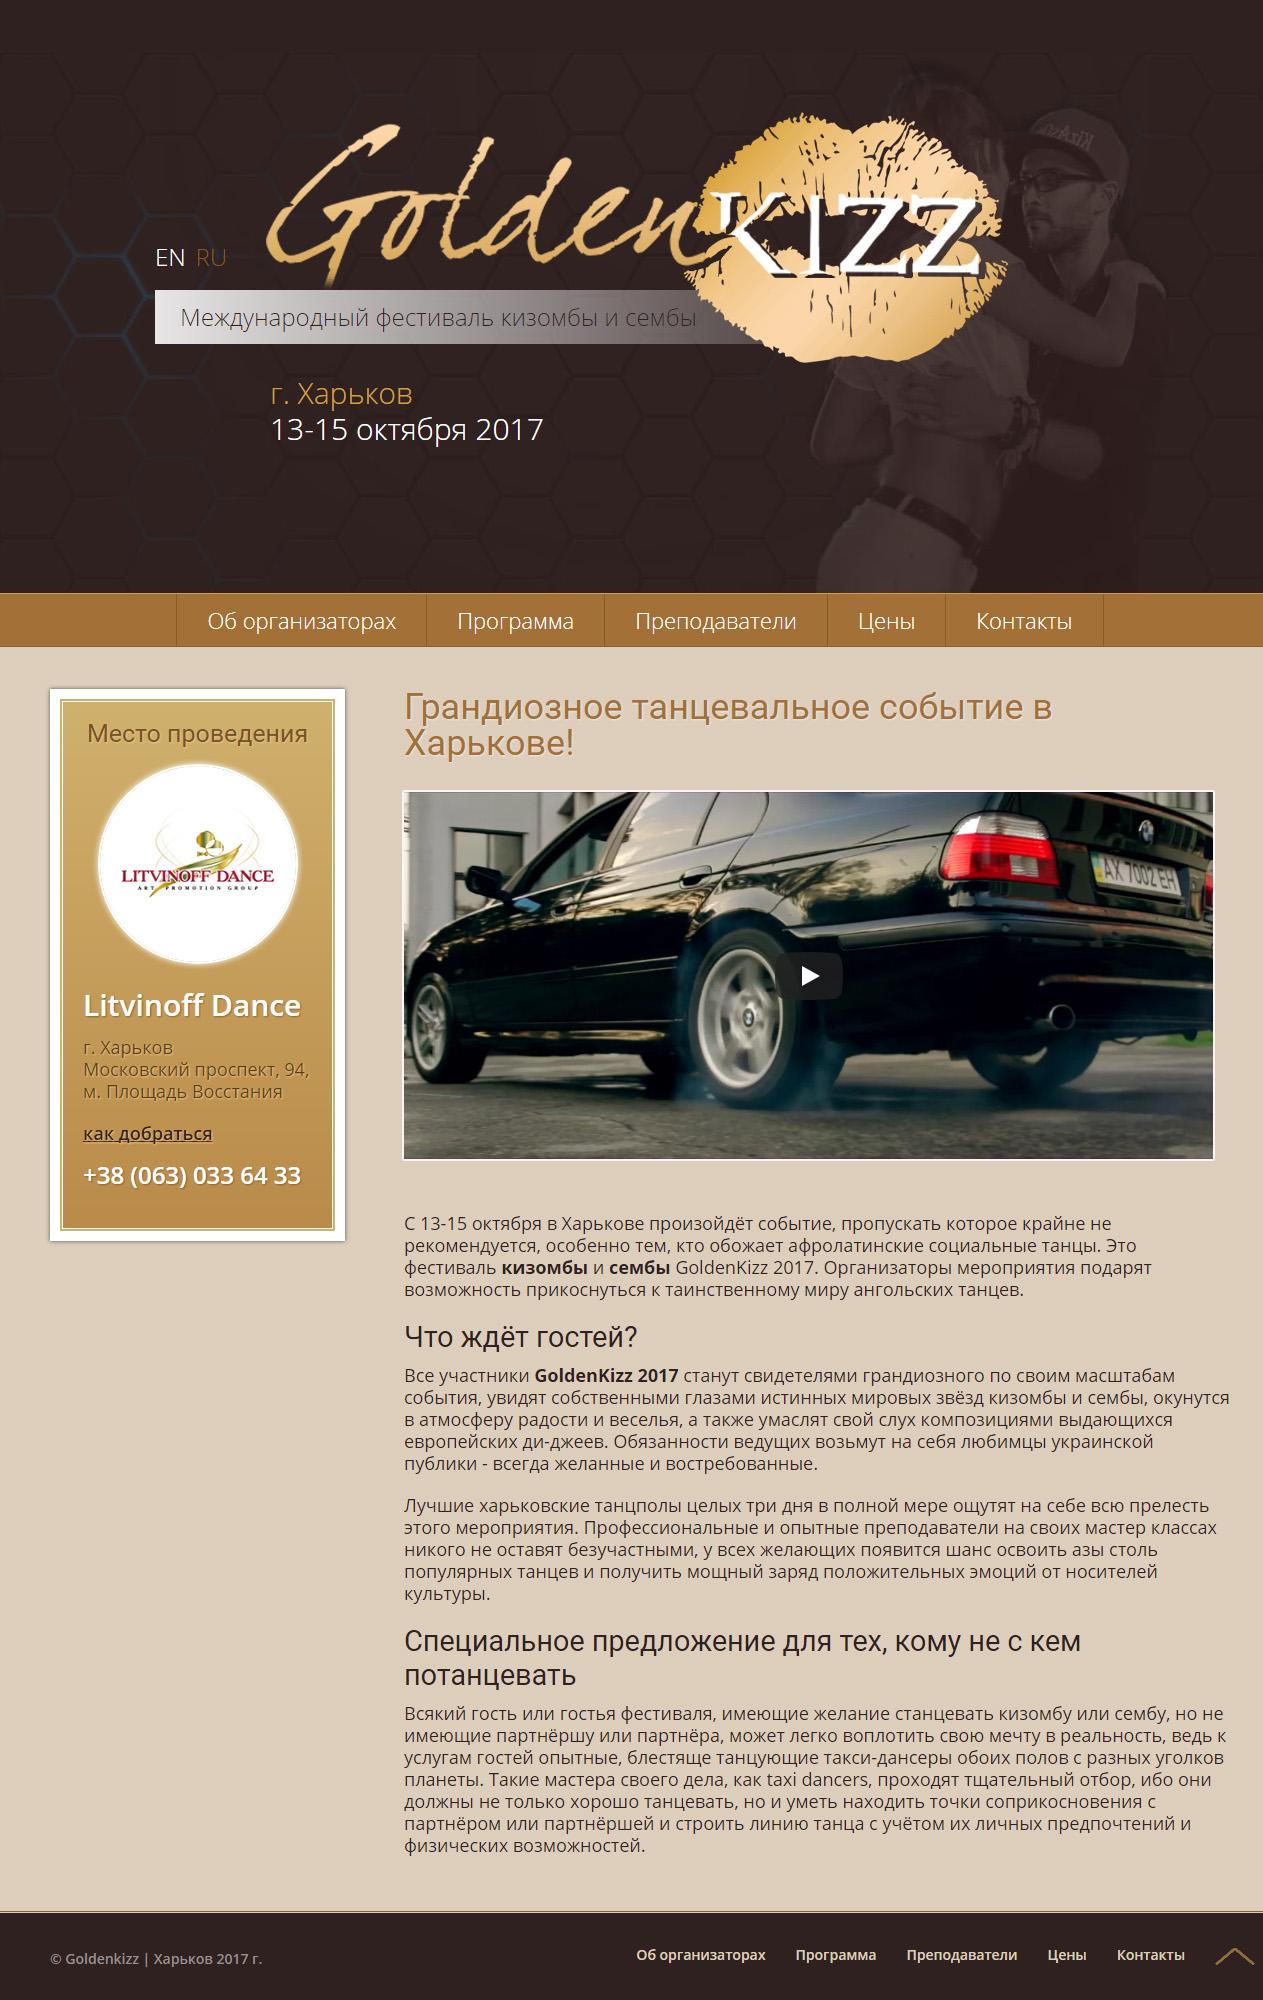 Сайт-визитка фестиваля Goldenkizz (Joomla)